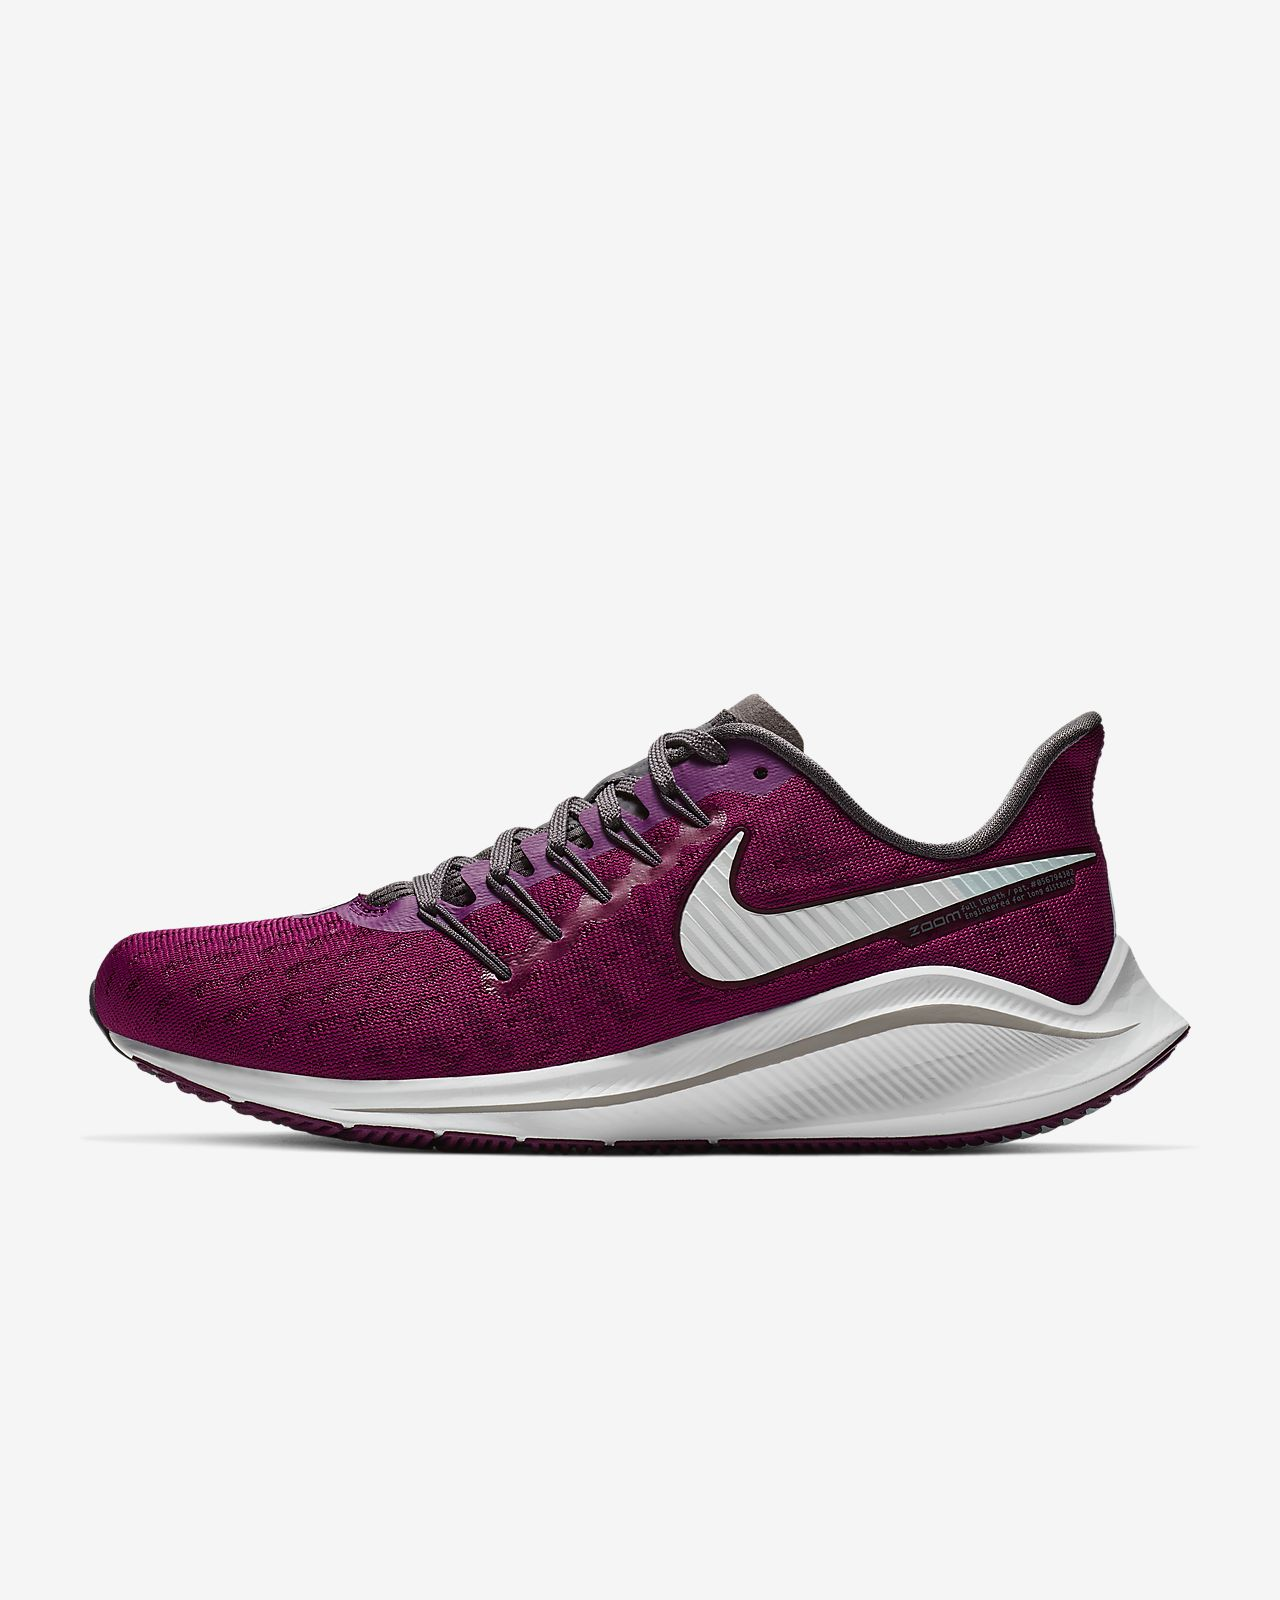 75036e728 Nike Air Zoom Vomero 14 Women s Running Shoe. Nike.com